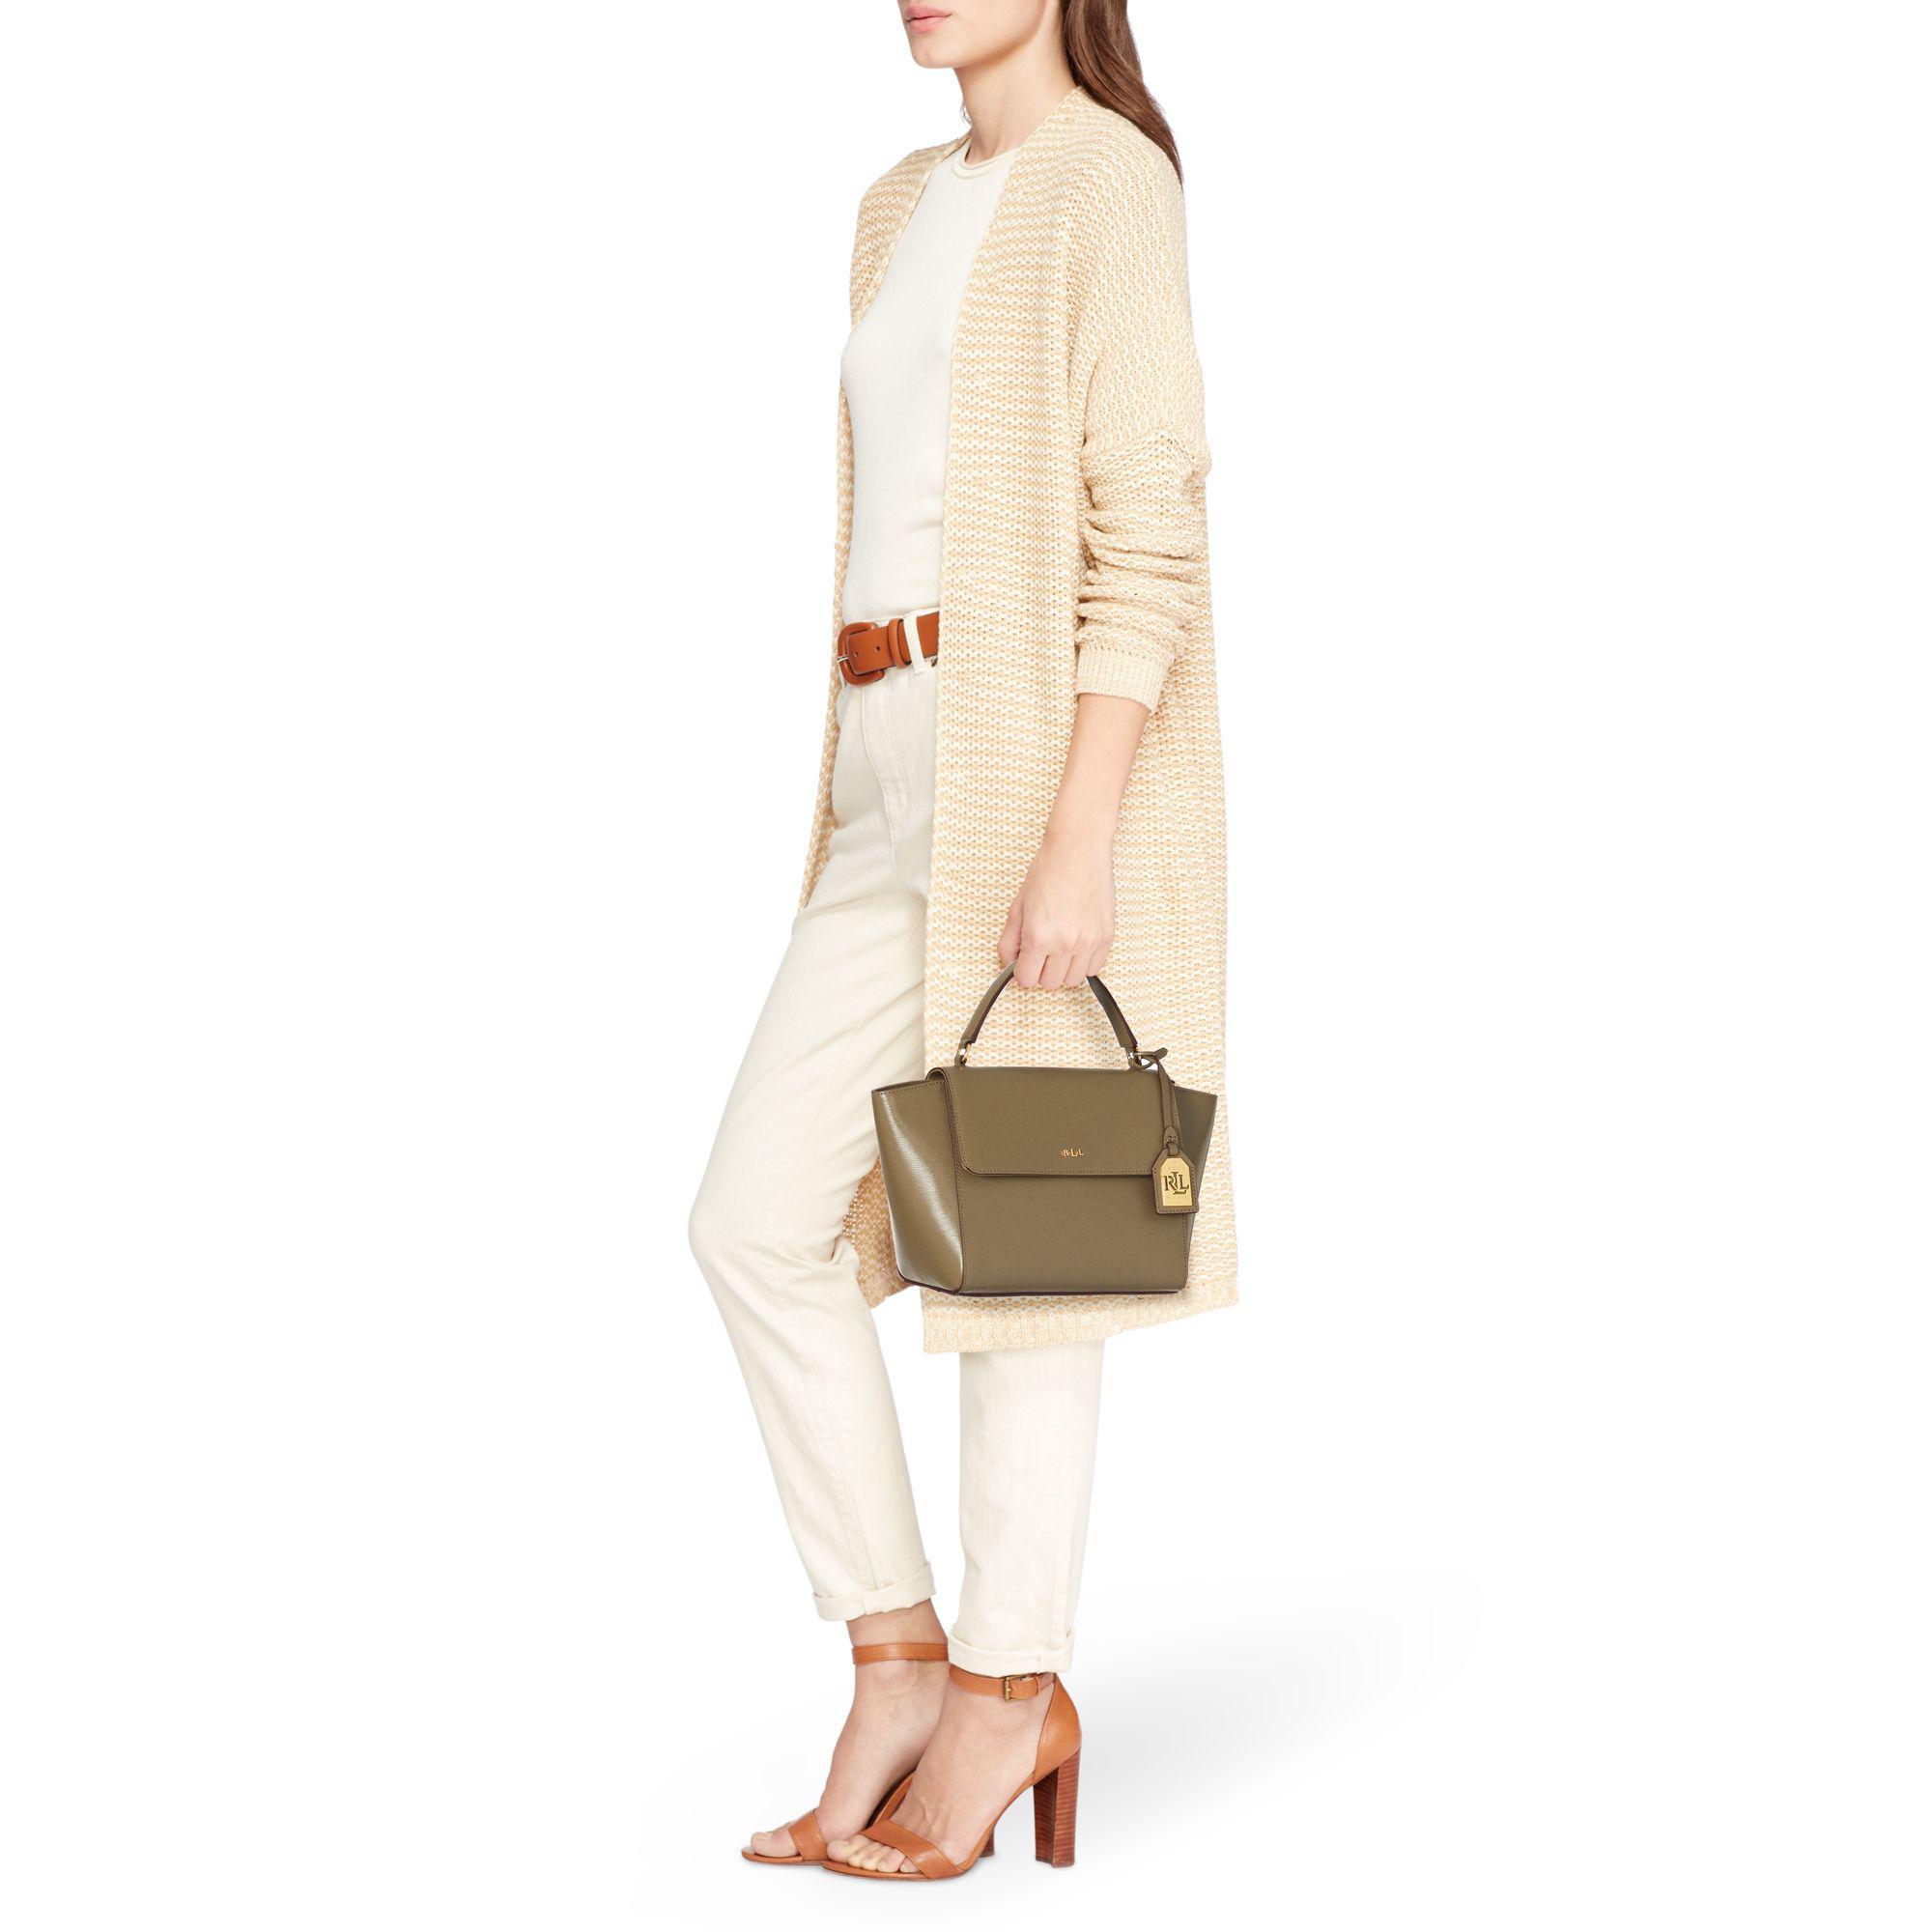 dea3b96b5 Ralph Lauren Leather Barclay Crossbody Bag - Lyst